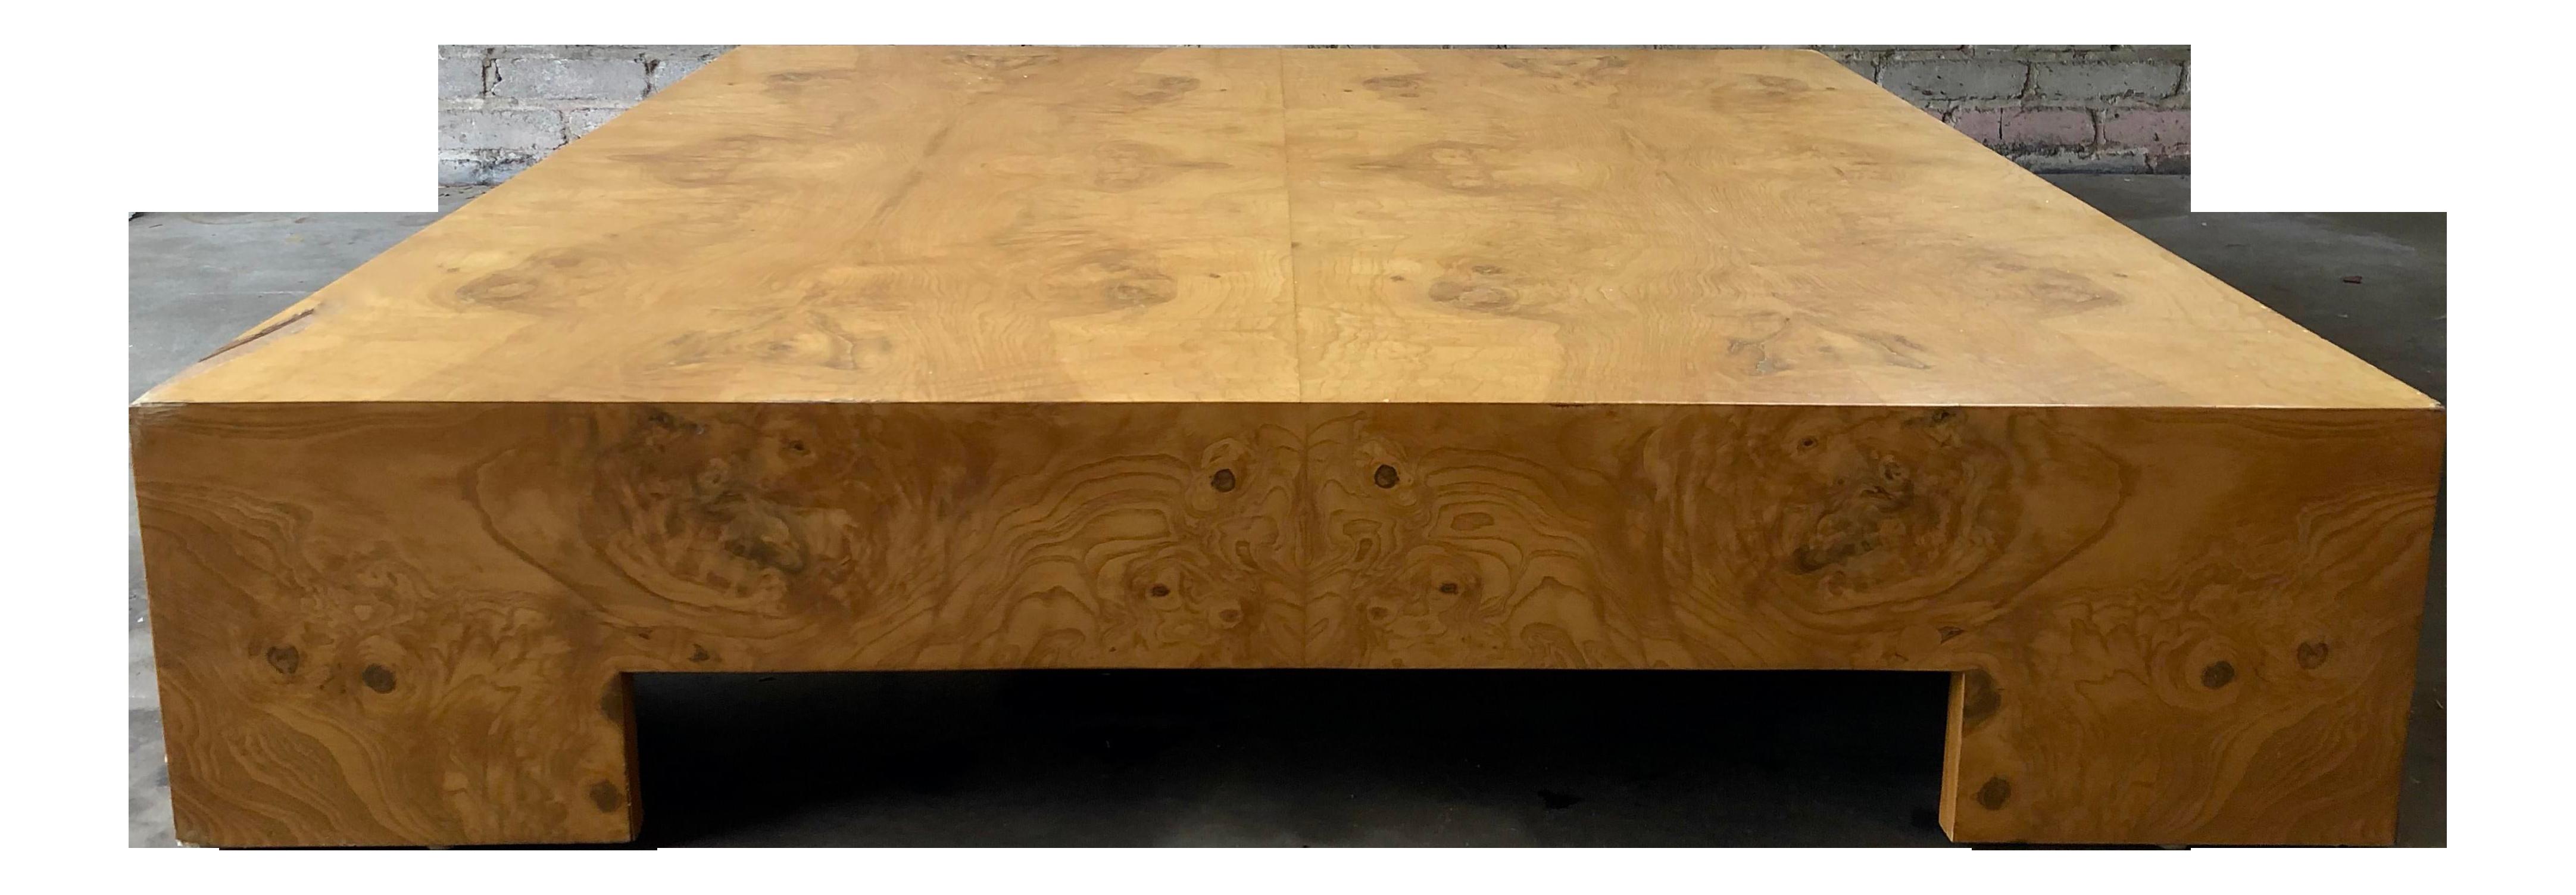 Midkiff Modern Coffee Table Mirrored Coffee Tables Faux Marble Coffee Table Marble Coffee Table Set [ 800 x 1200 Pixel ]